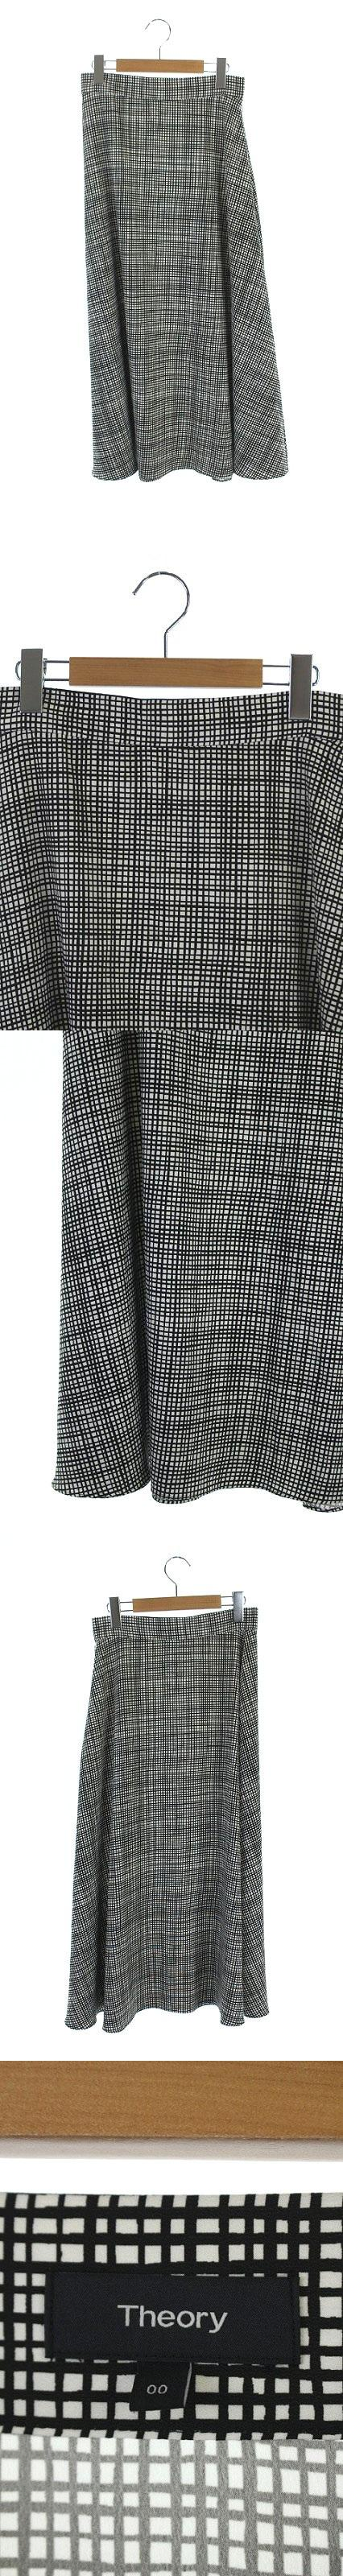 19SS スカート ロング フレア 00 白 黒 /HH ■OS